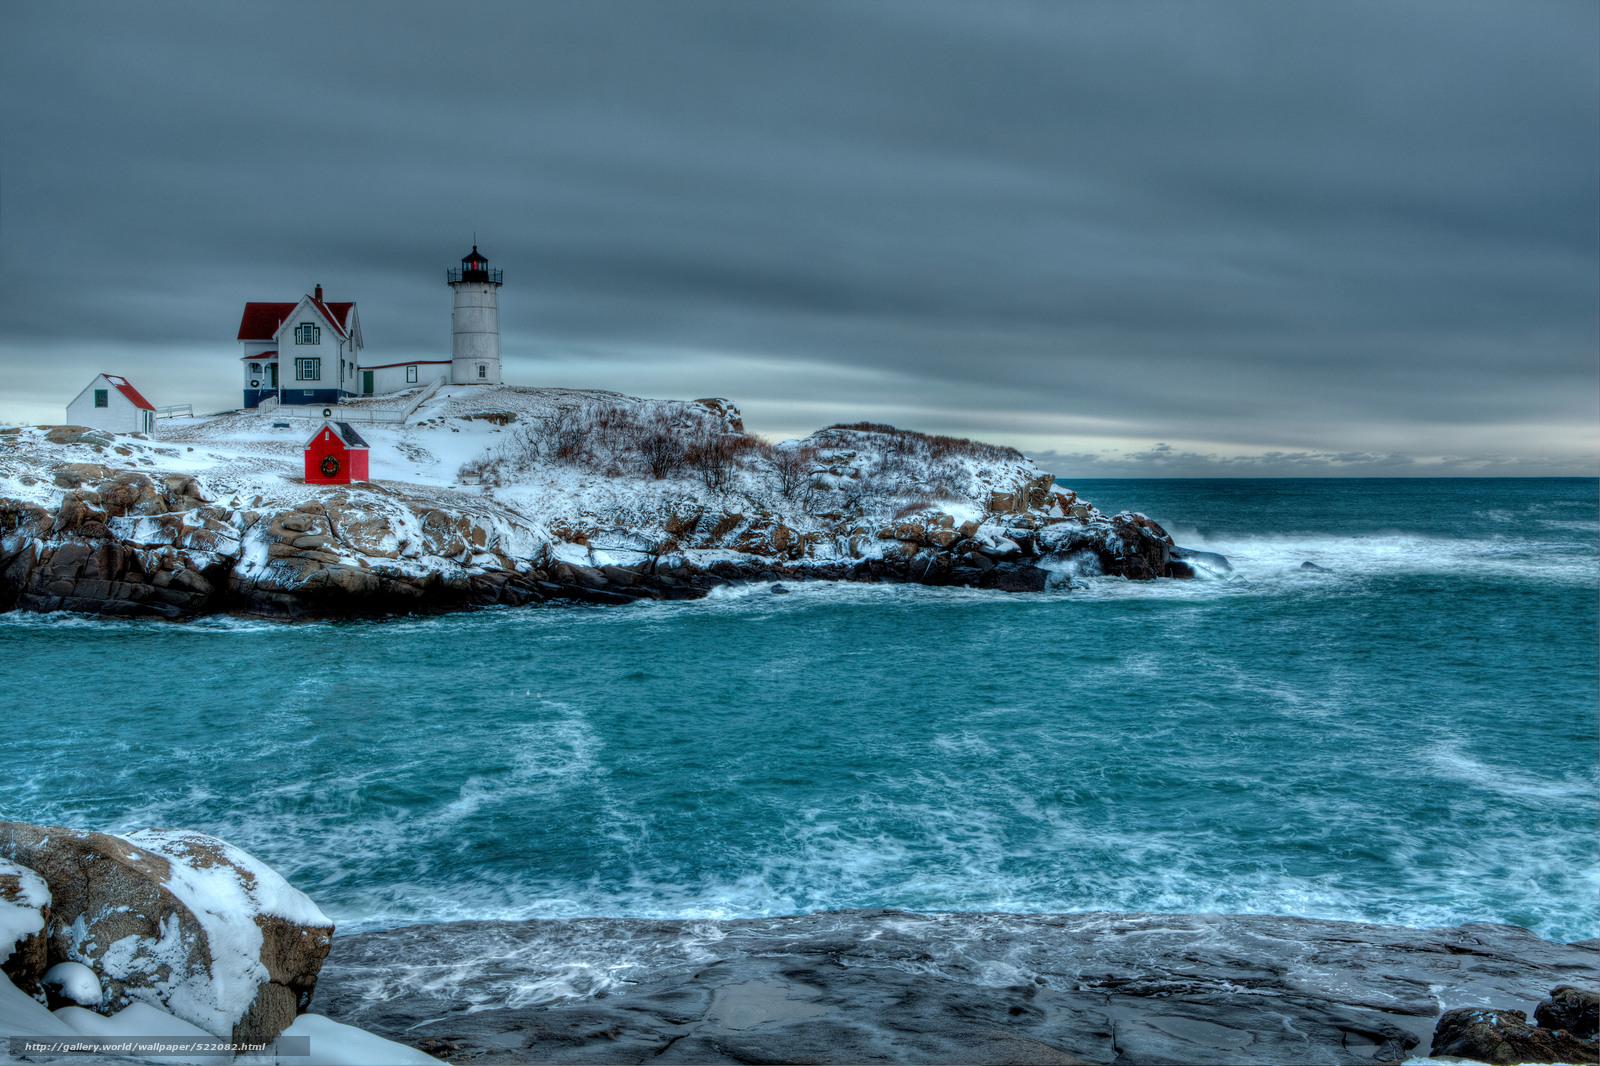 wallpaper Winter sea rocky shores lighthouse desktop wallpaper 1600x1066